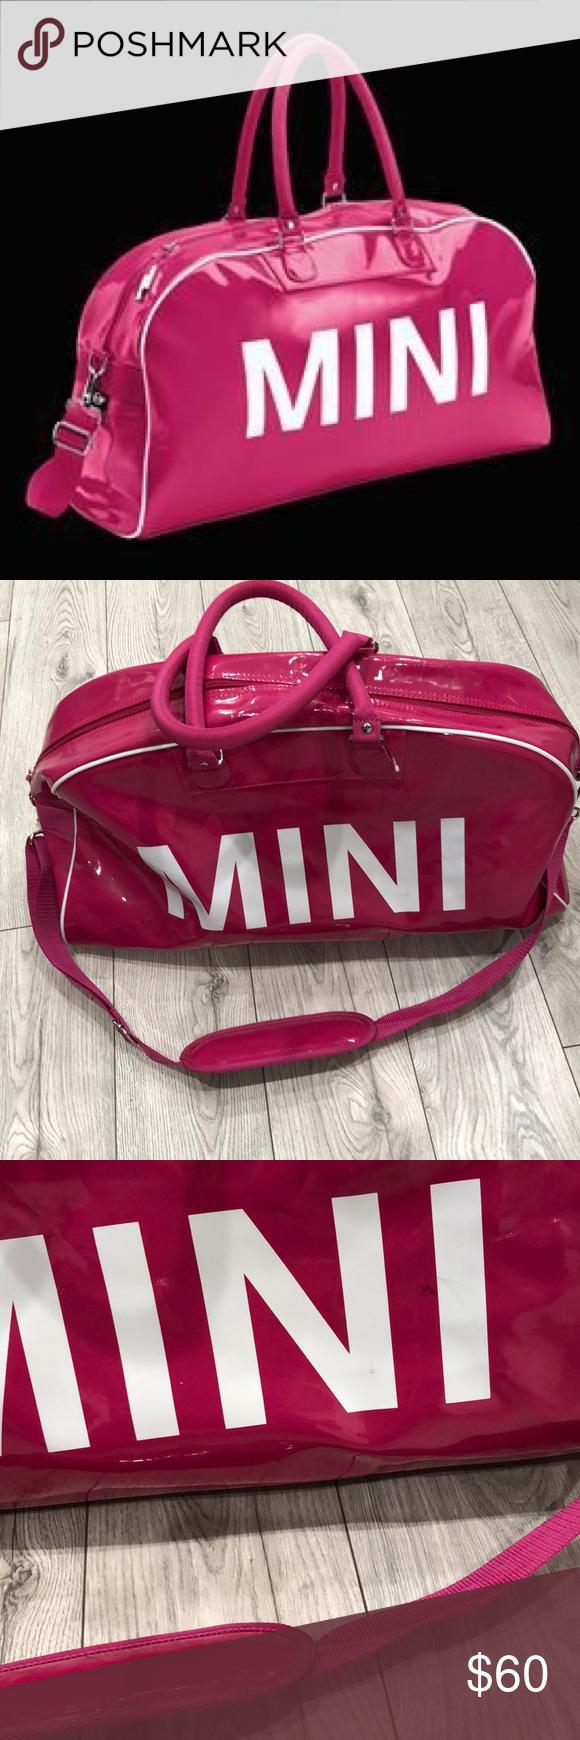 Mini Cooper Duffle Bag Bags Duffle Bag Mini